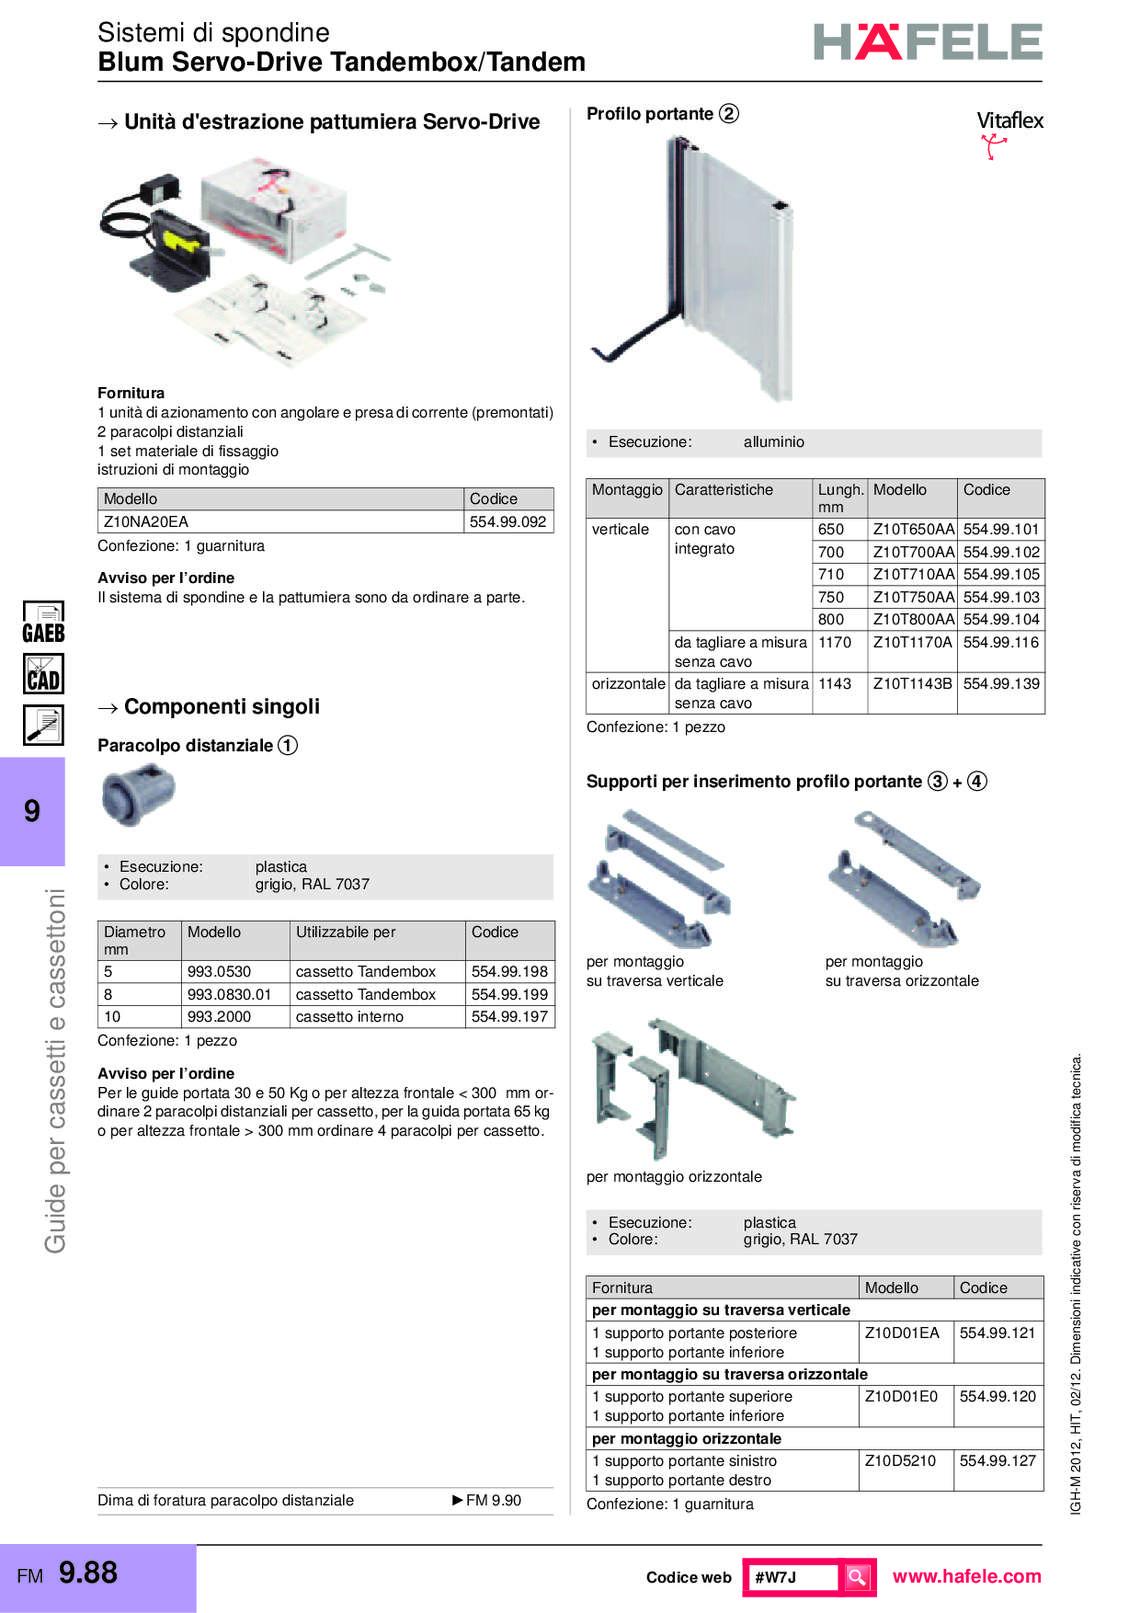 hafele-spondine-e-guide-per-mobili_40_111.jpg